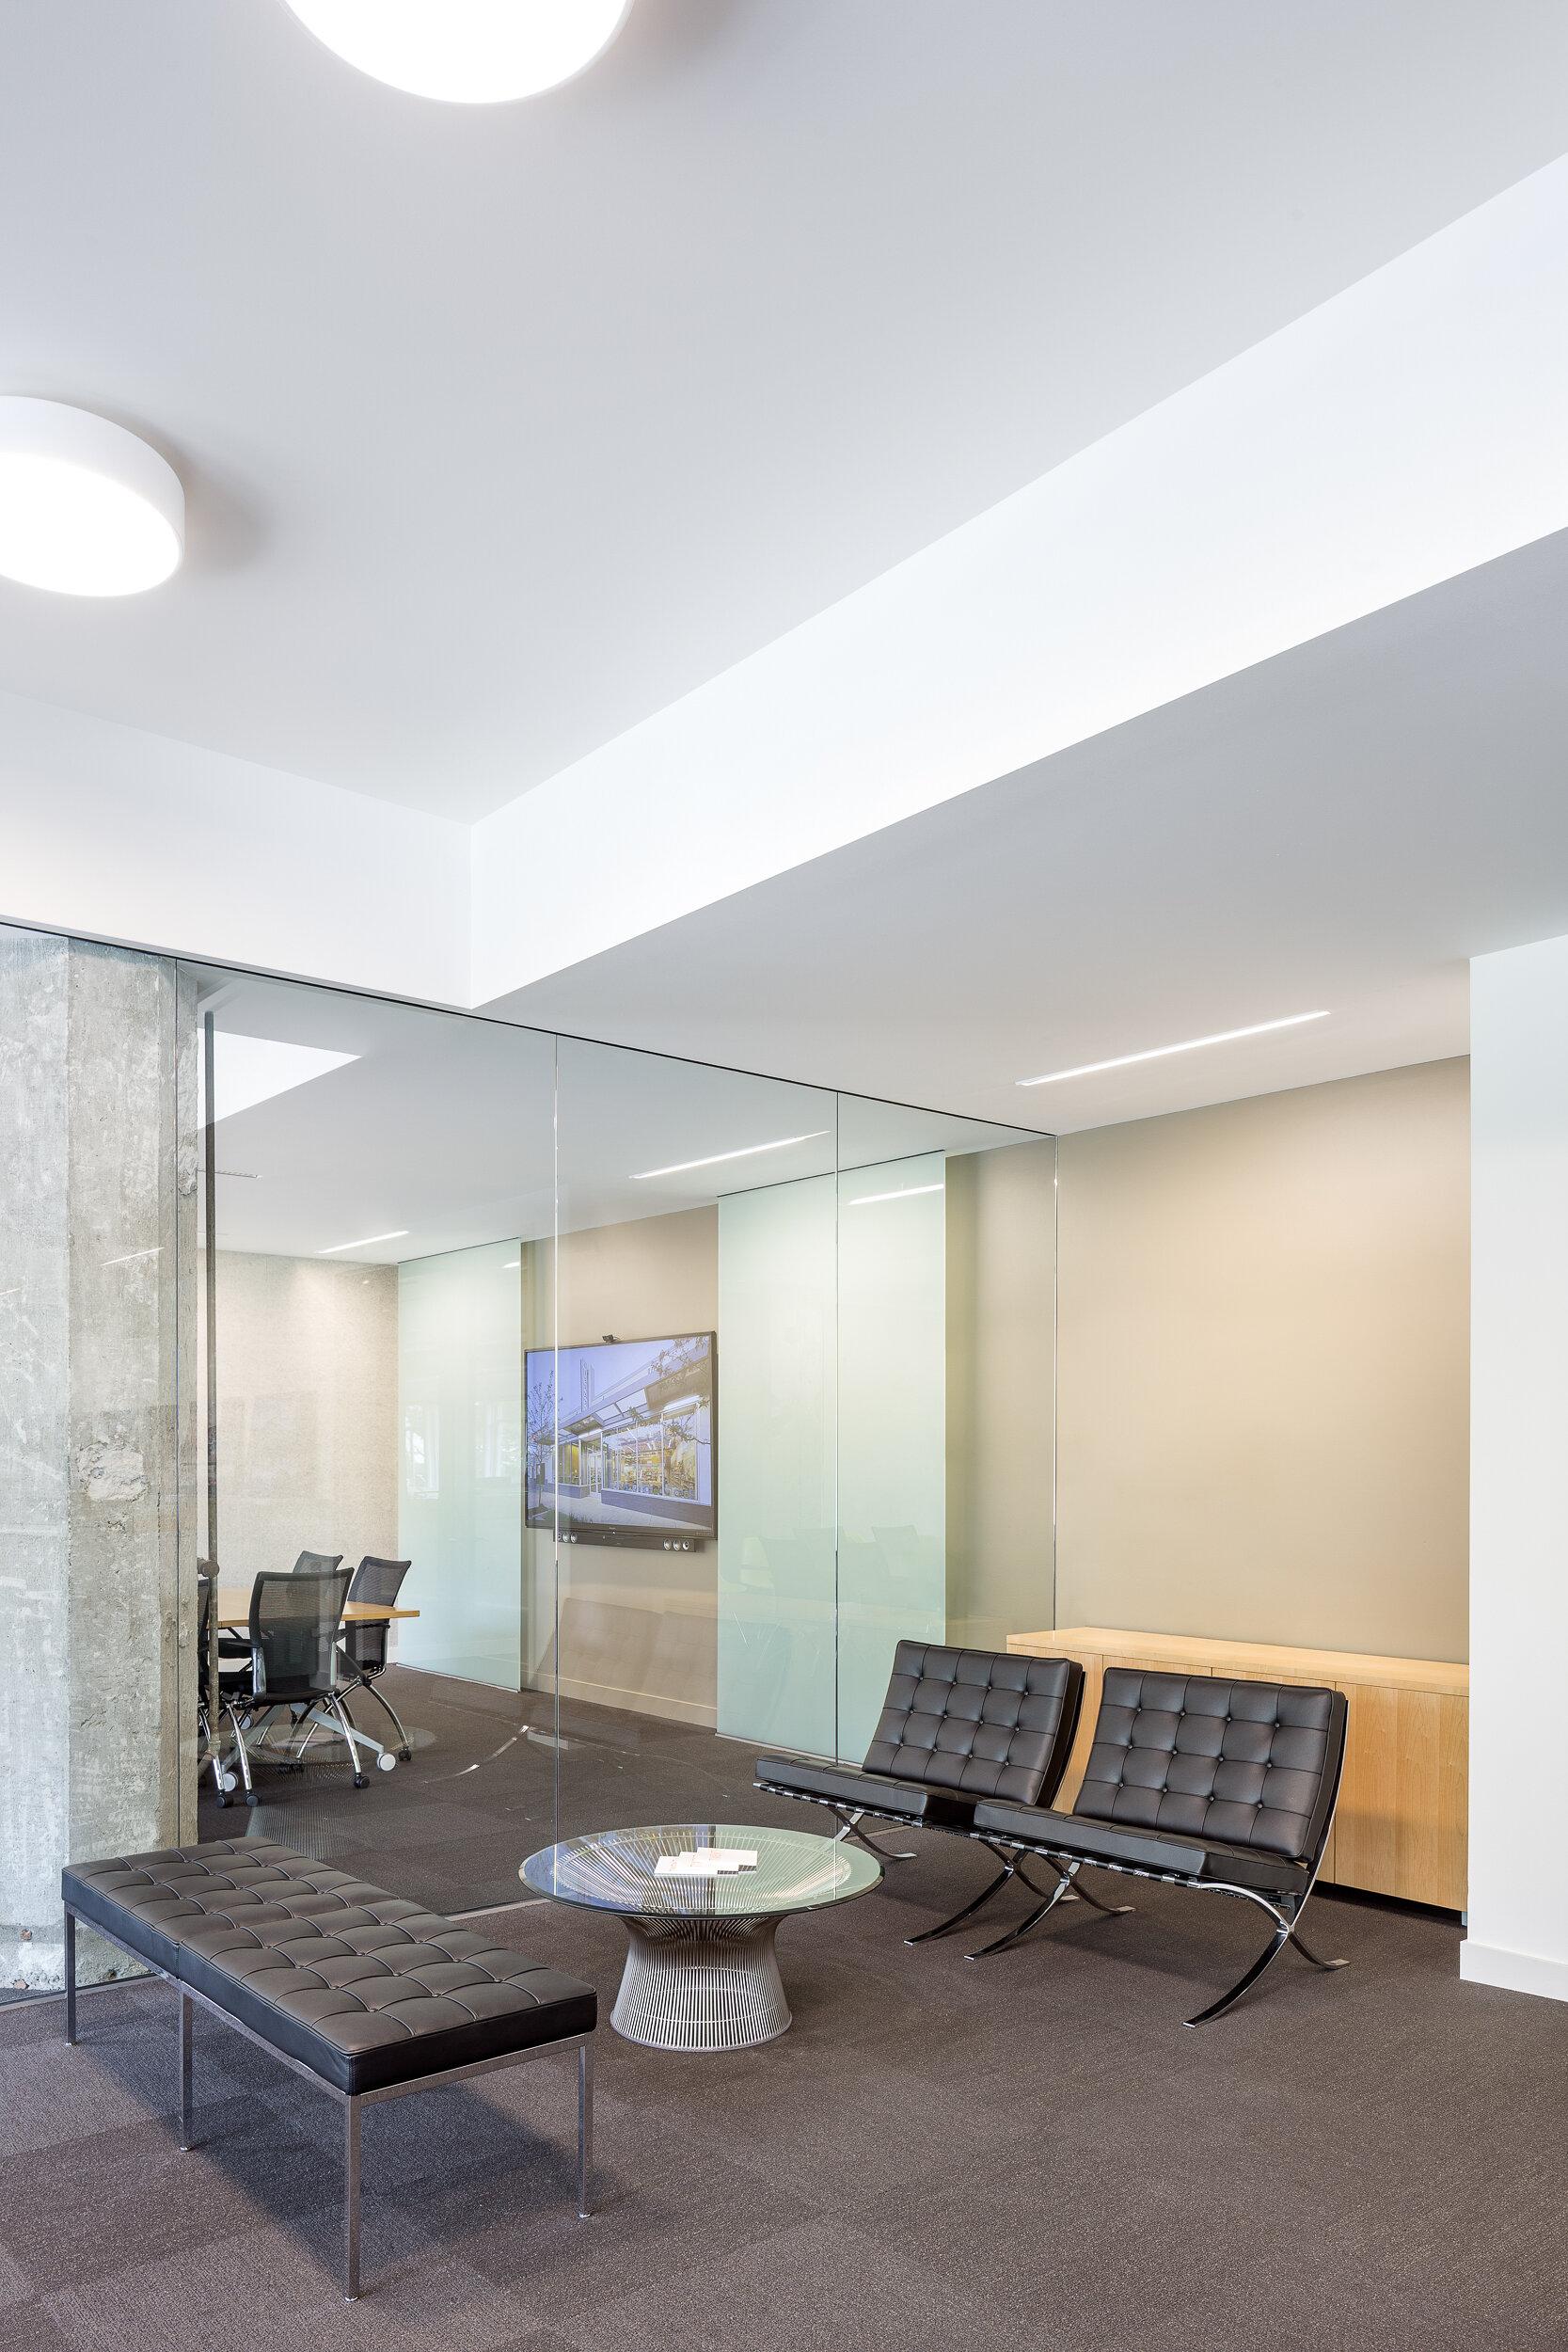 21-HEA-Office-JoshPartee-1343-entry-stg-grp.jpg